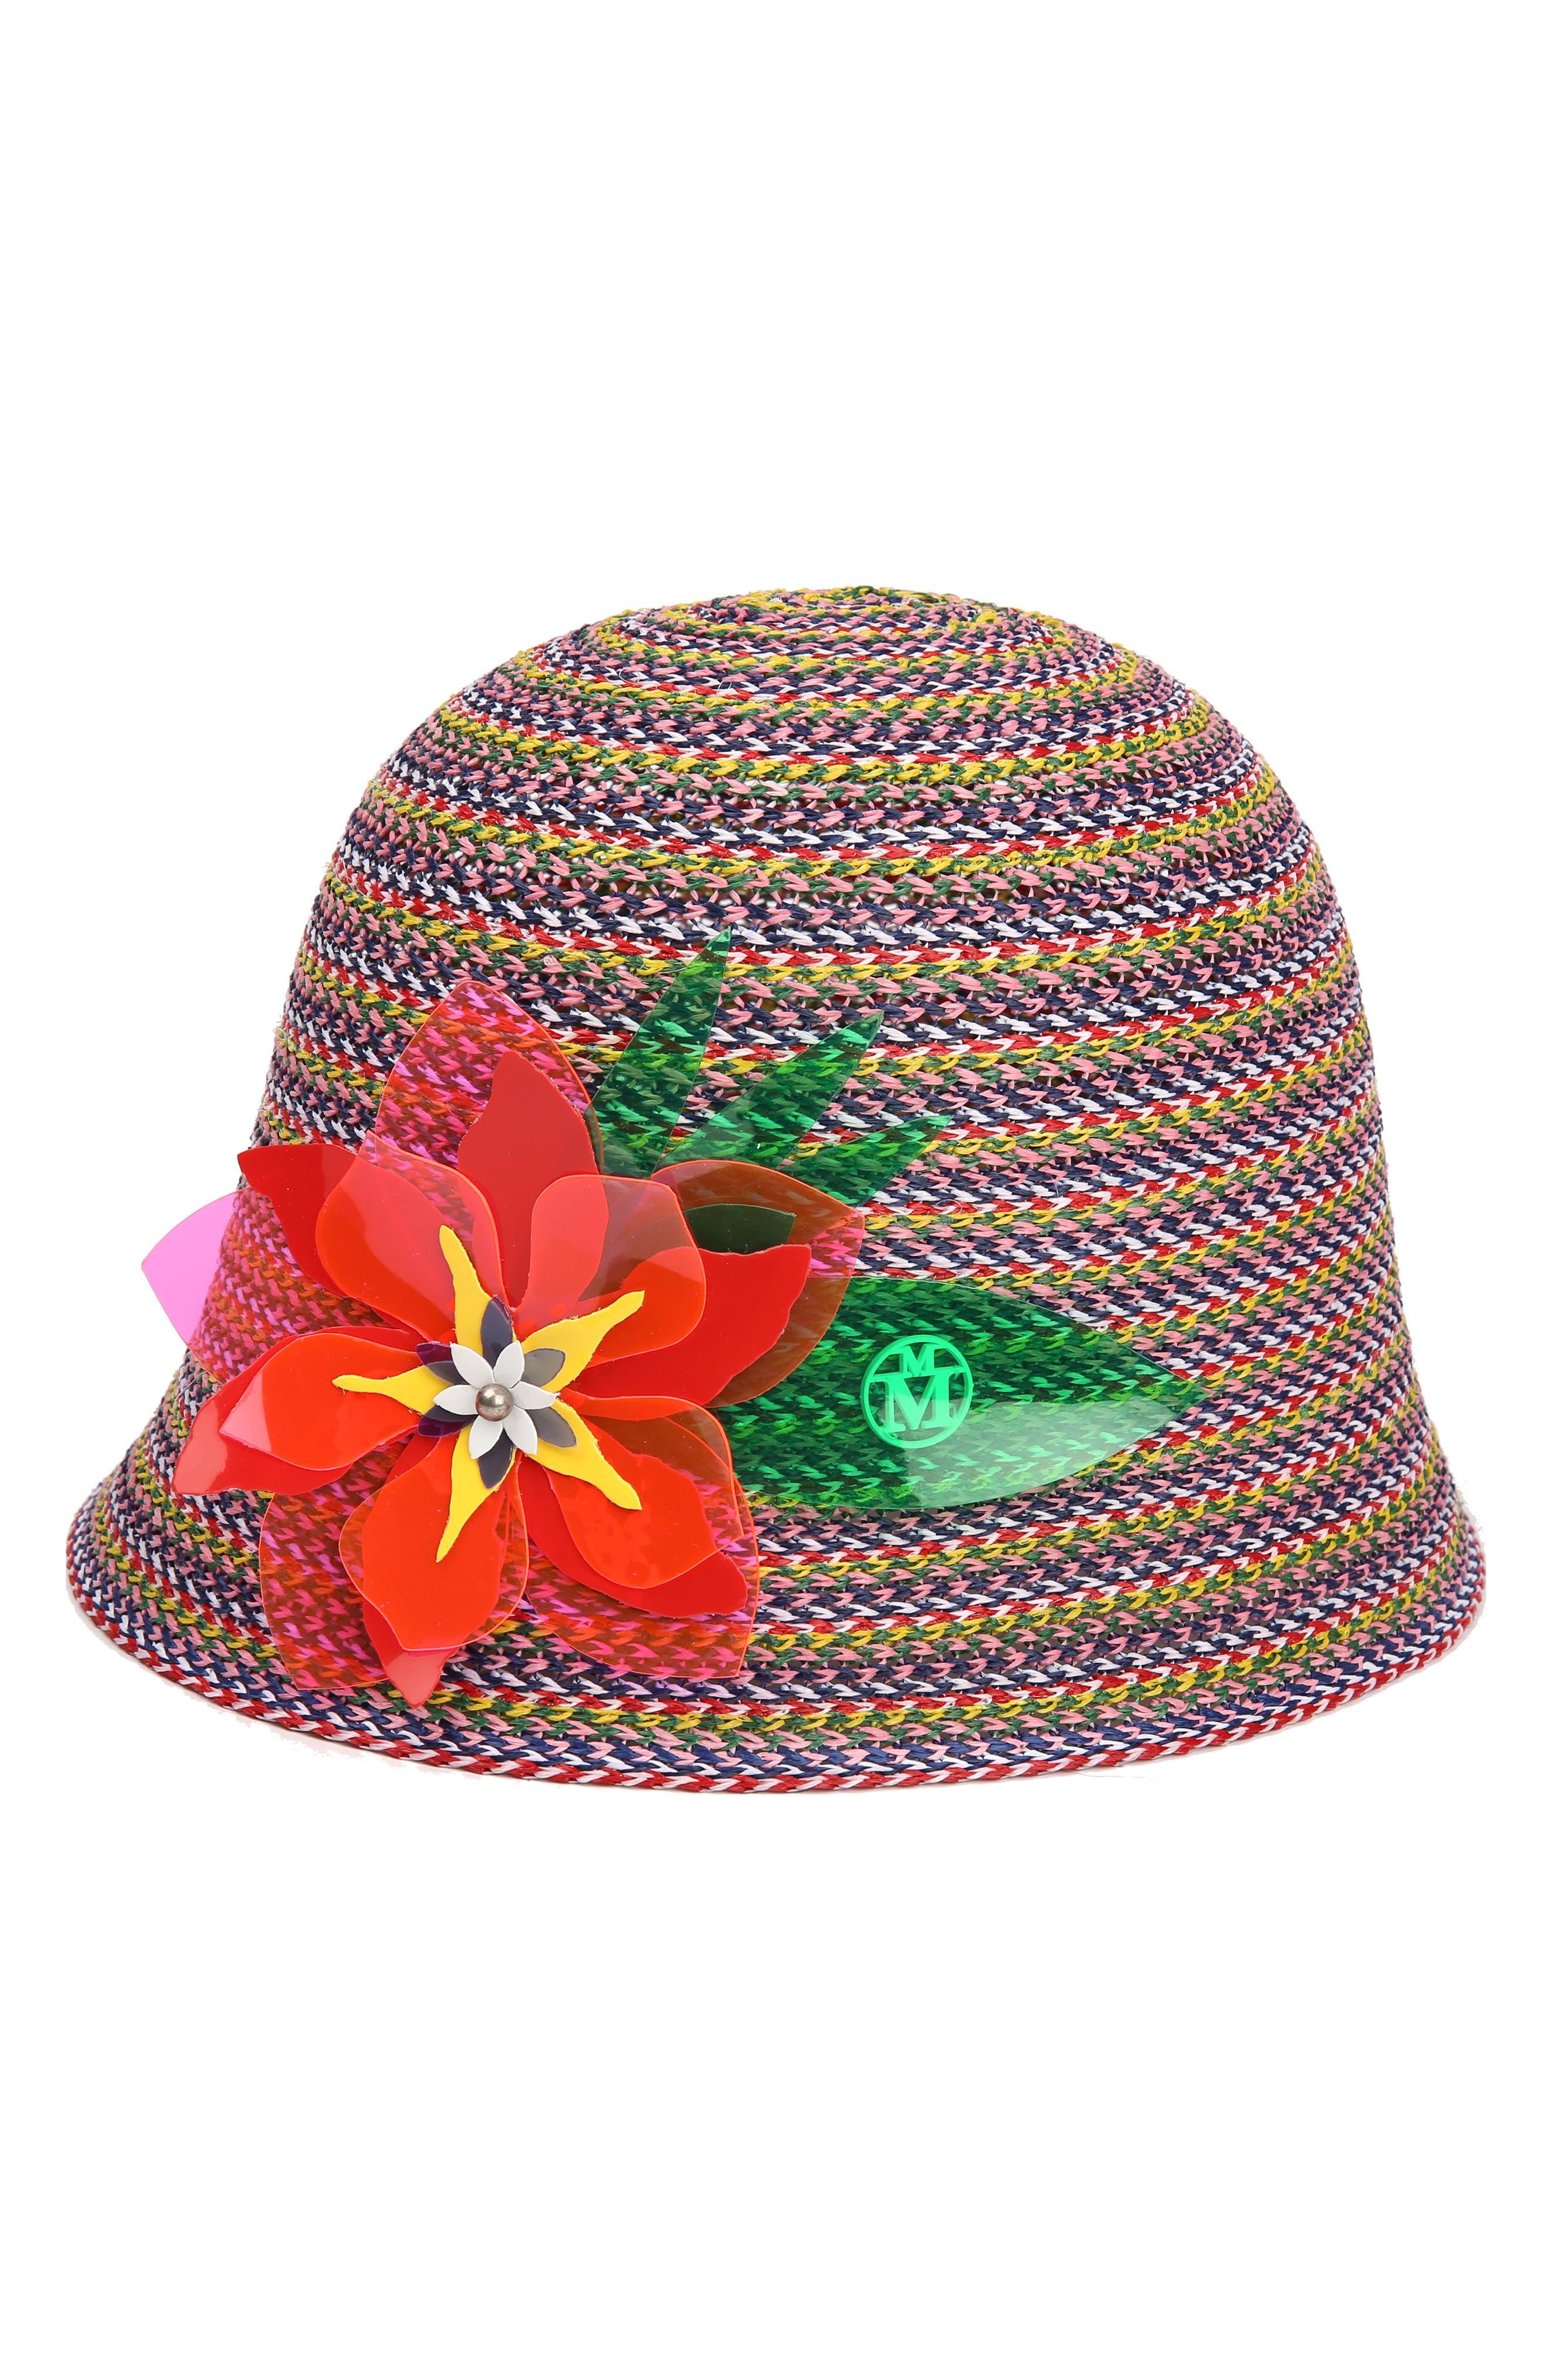 Jin Multicolor Straw Hat,                             Main thumbnail 1, color,                             Multi